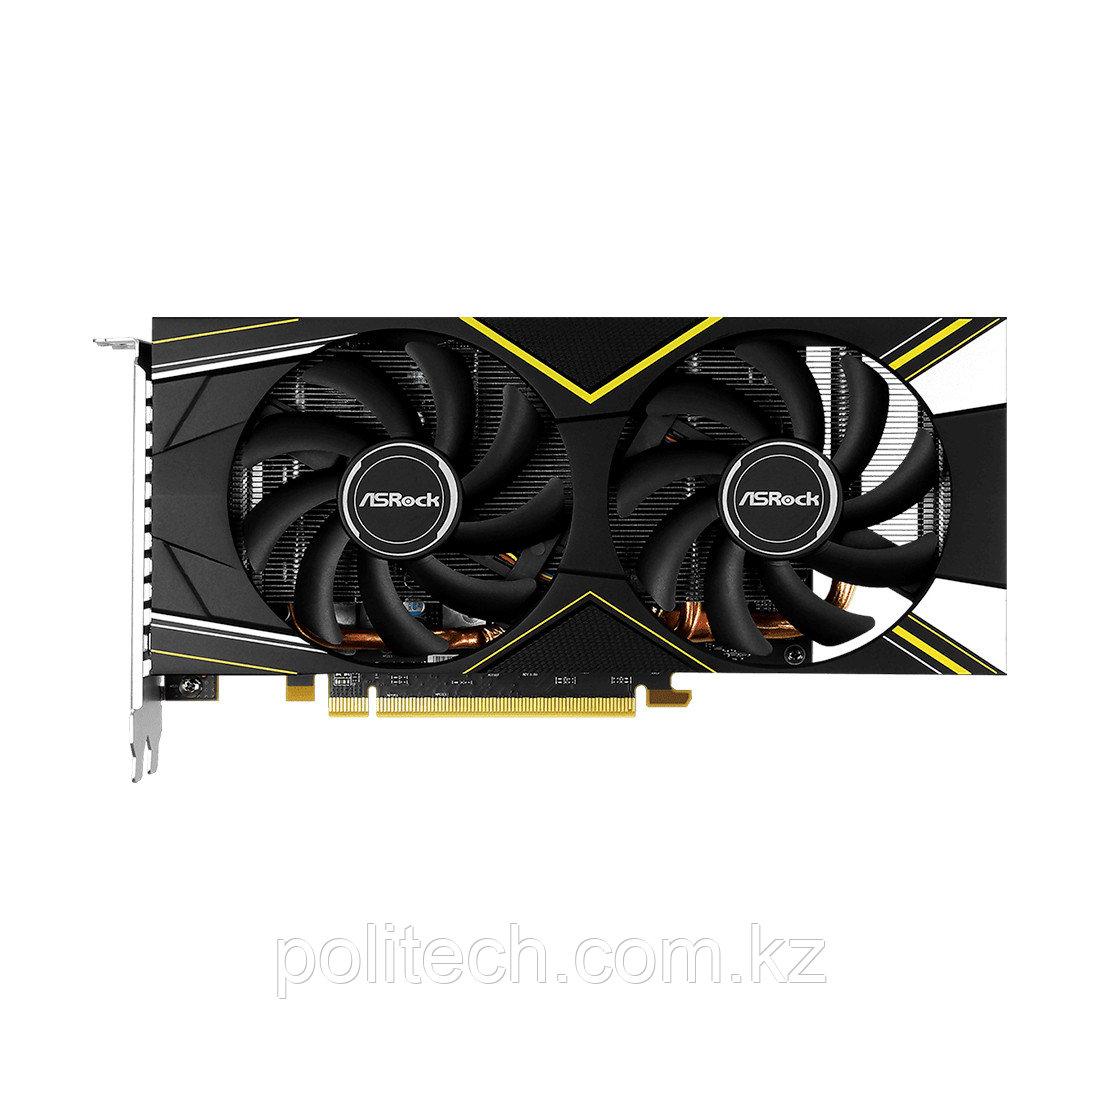 Видеокарта ASRock Radeon RX5500XT CLD 8GO